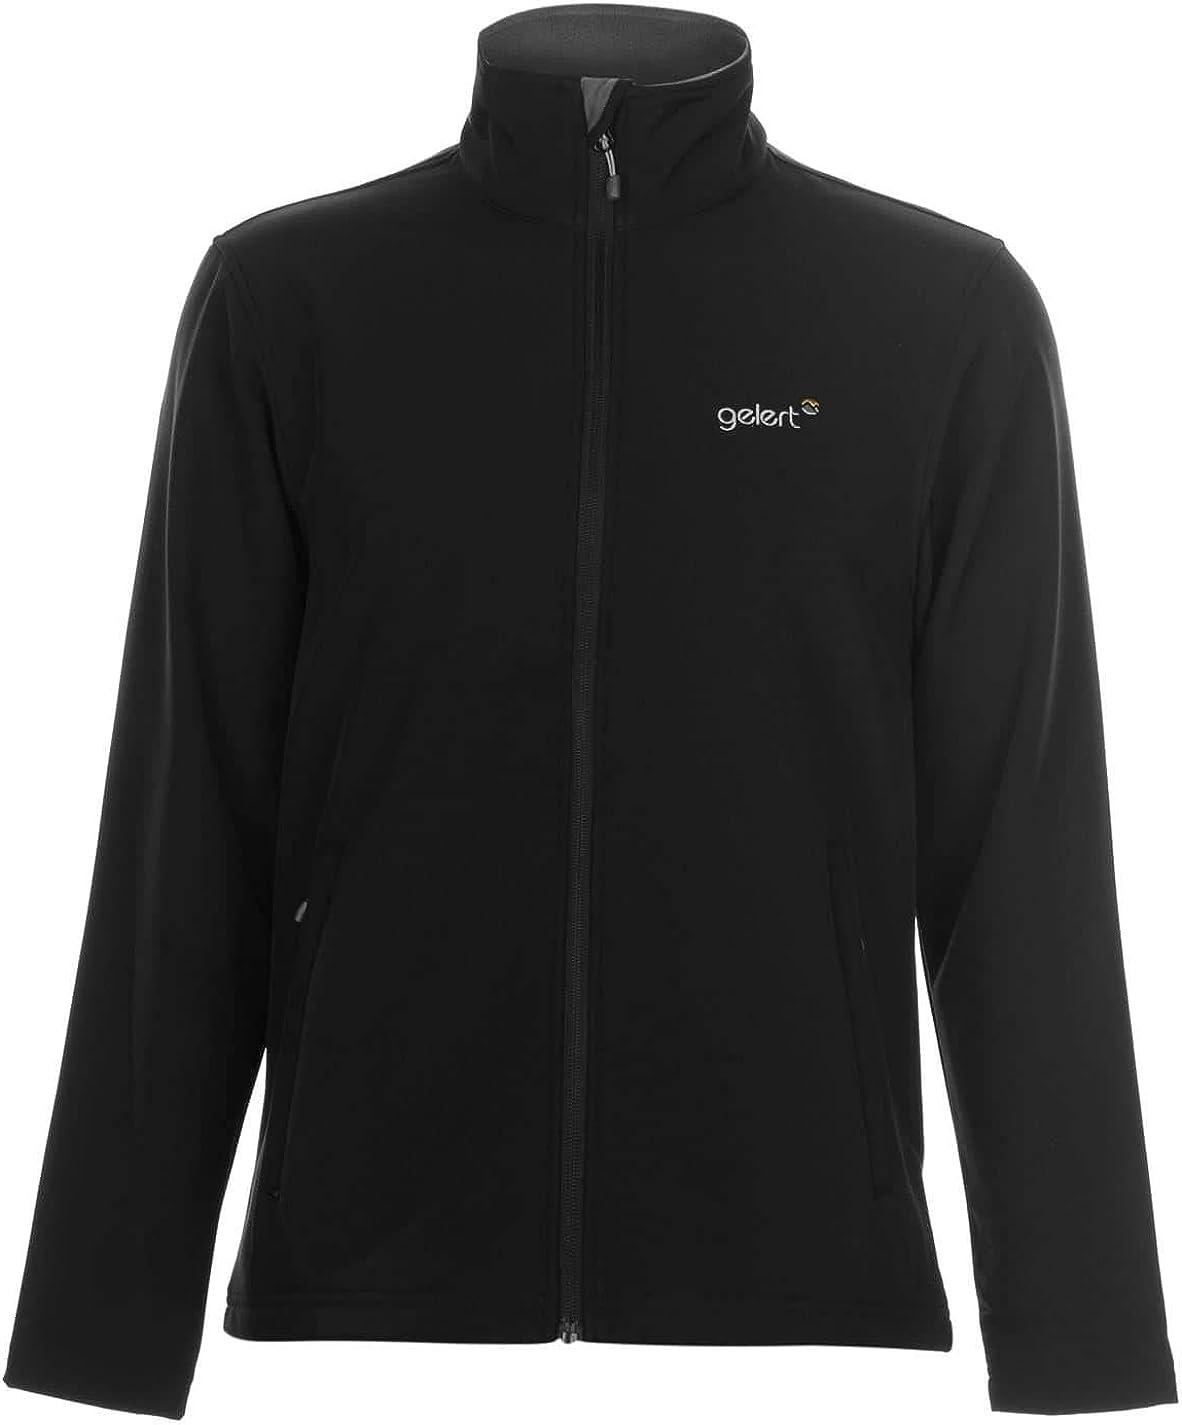 Gelert Mens Softshell Jacket Coat Top Long Sleeve Zip Warm